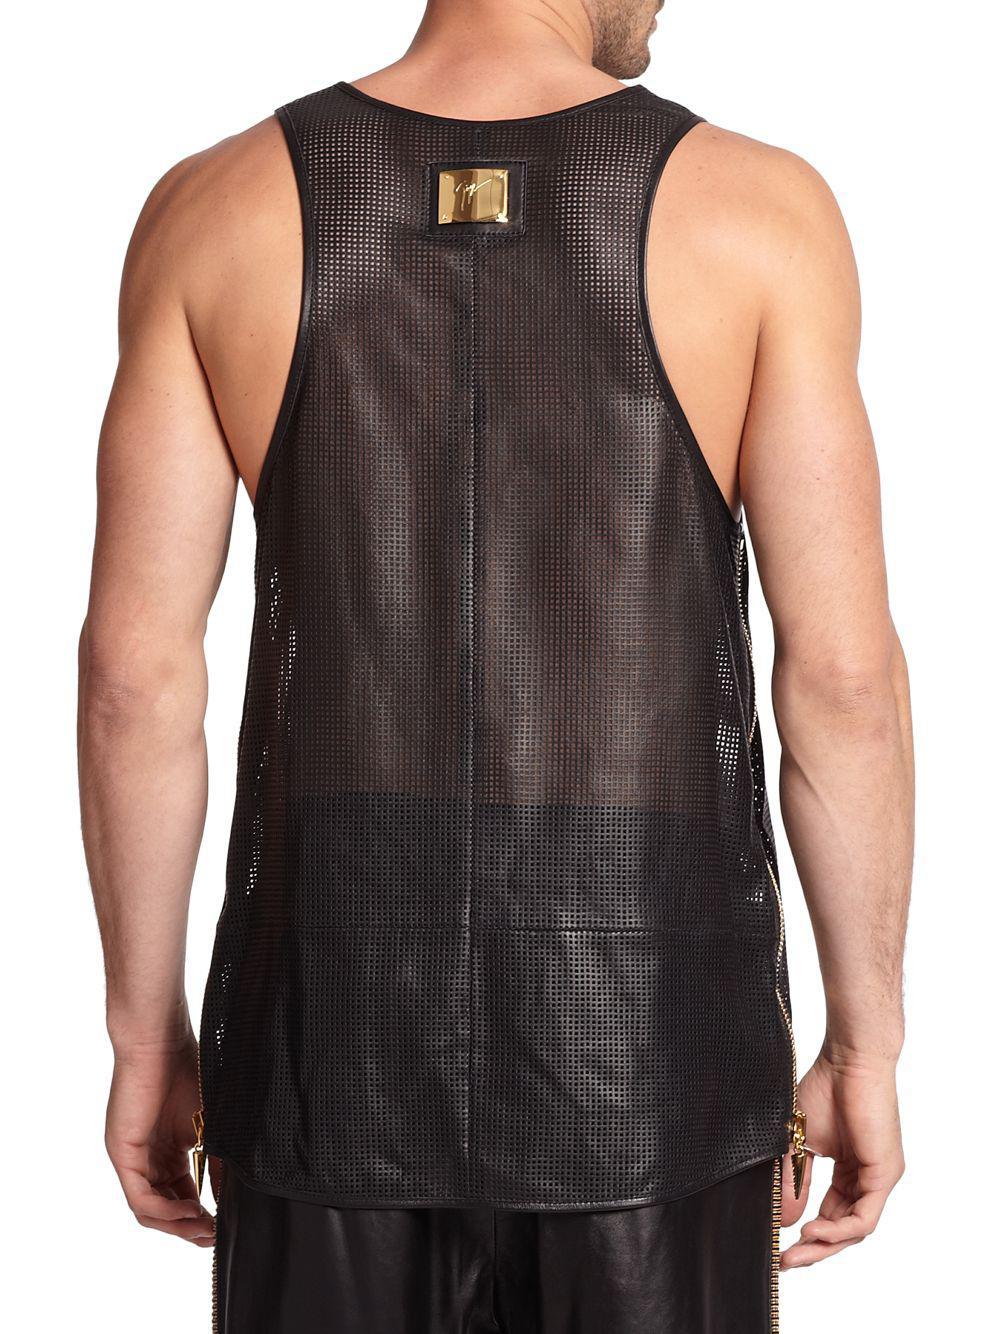 1d32e1ac61094 Giuseppe Zanotti - Black Zippered Leather Tank Top for Men - Lyst. View  fullscreen